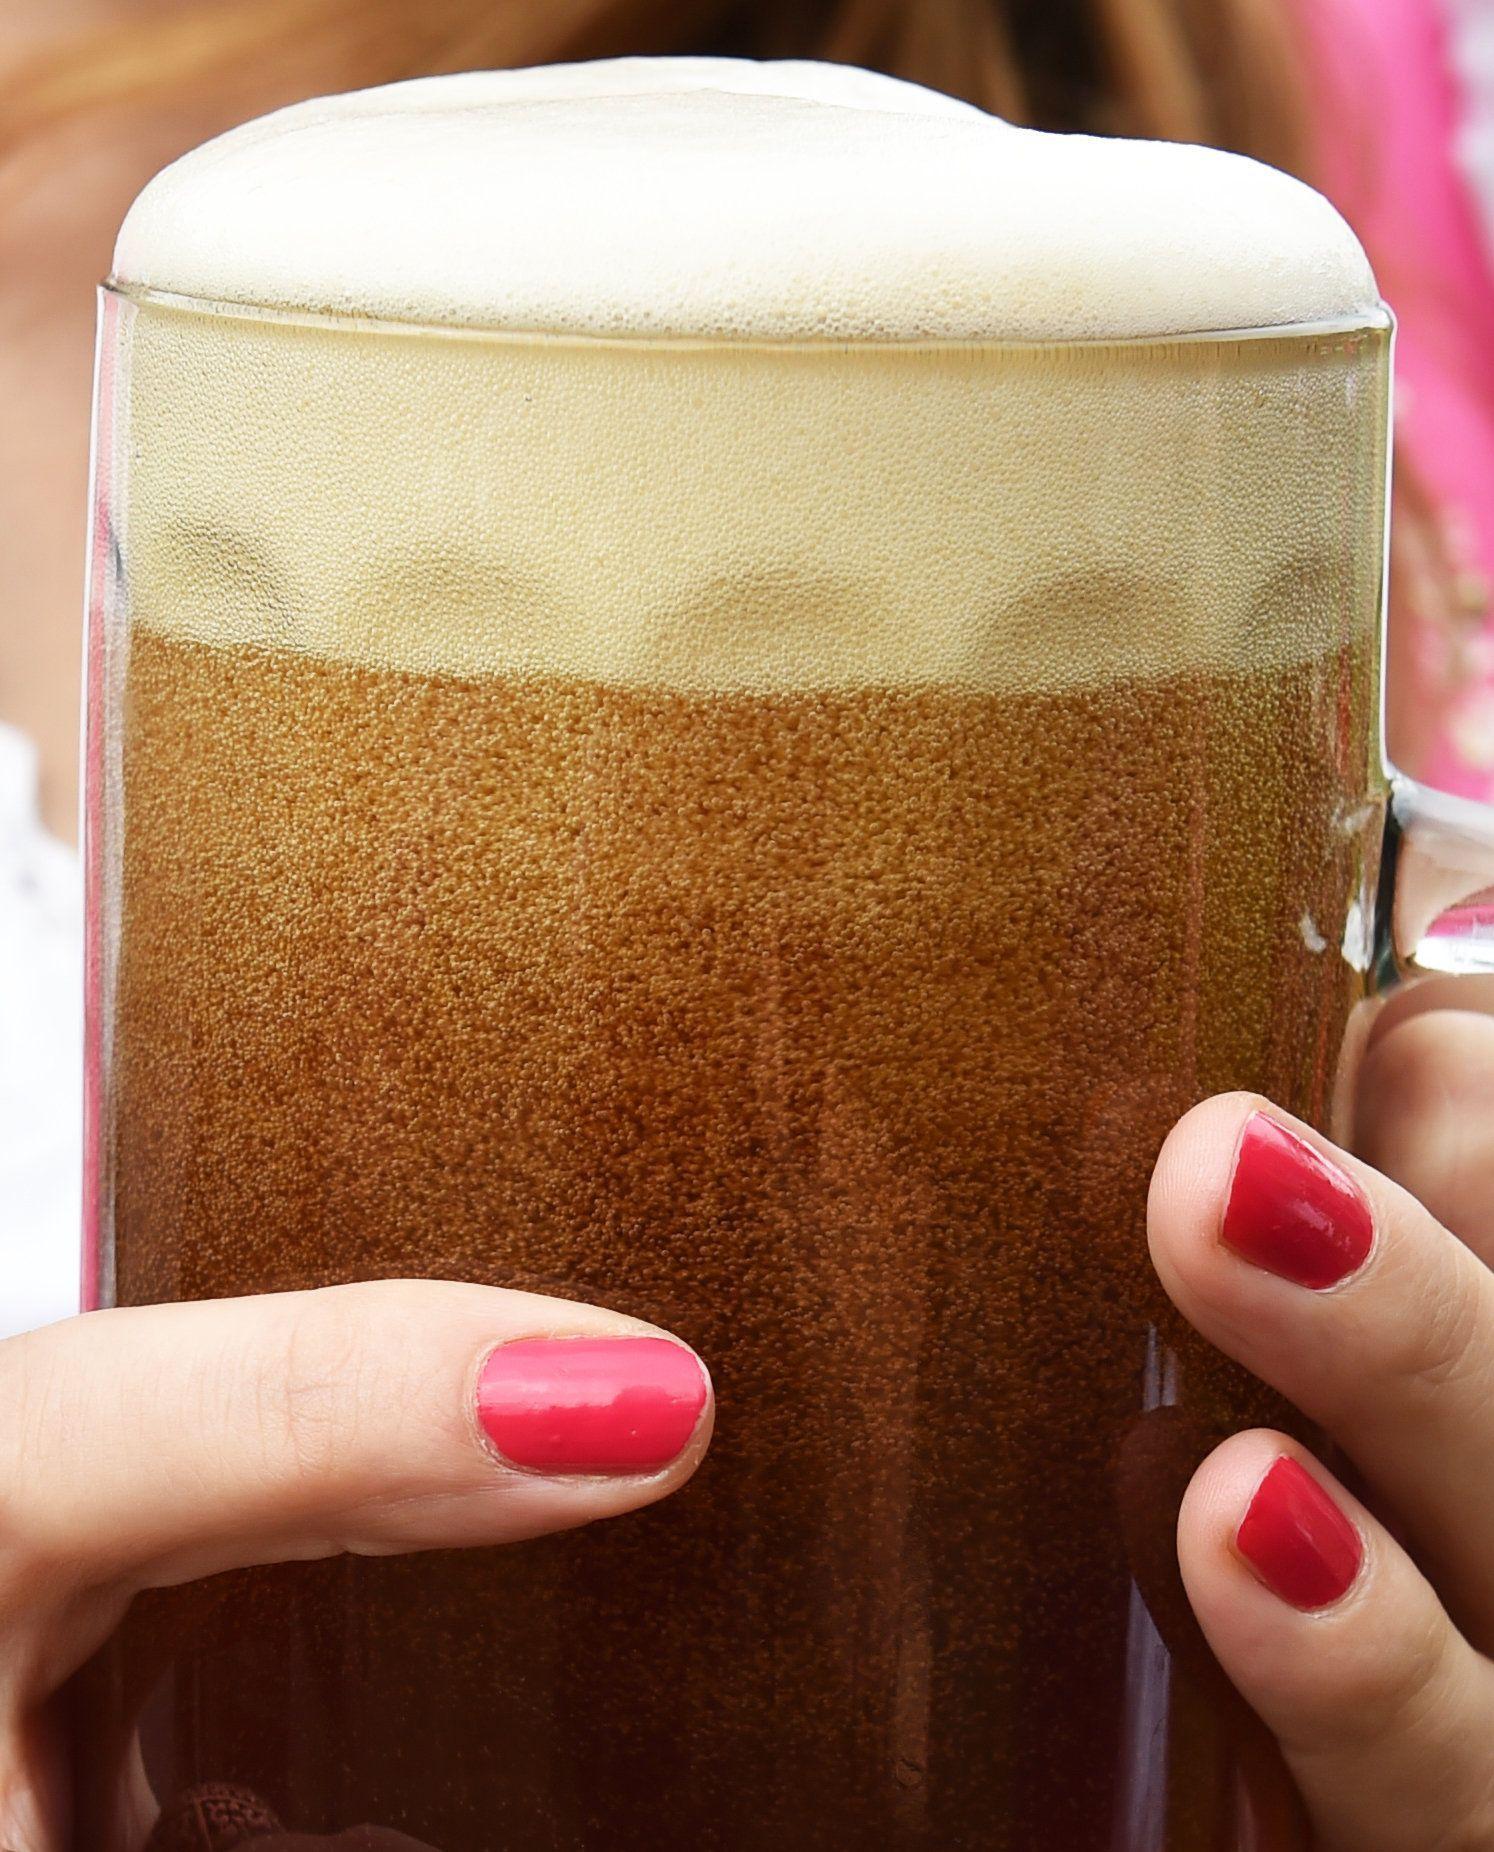 19. Internationales Berliner Bierfestival